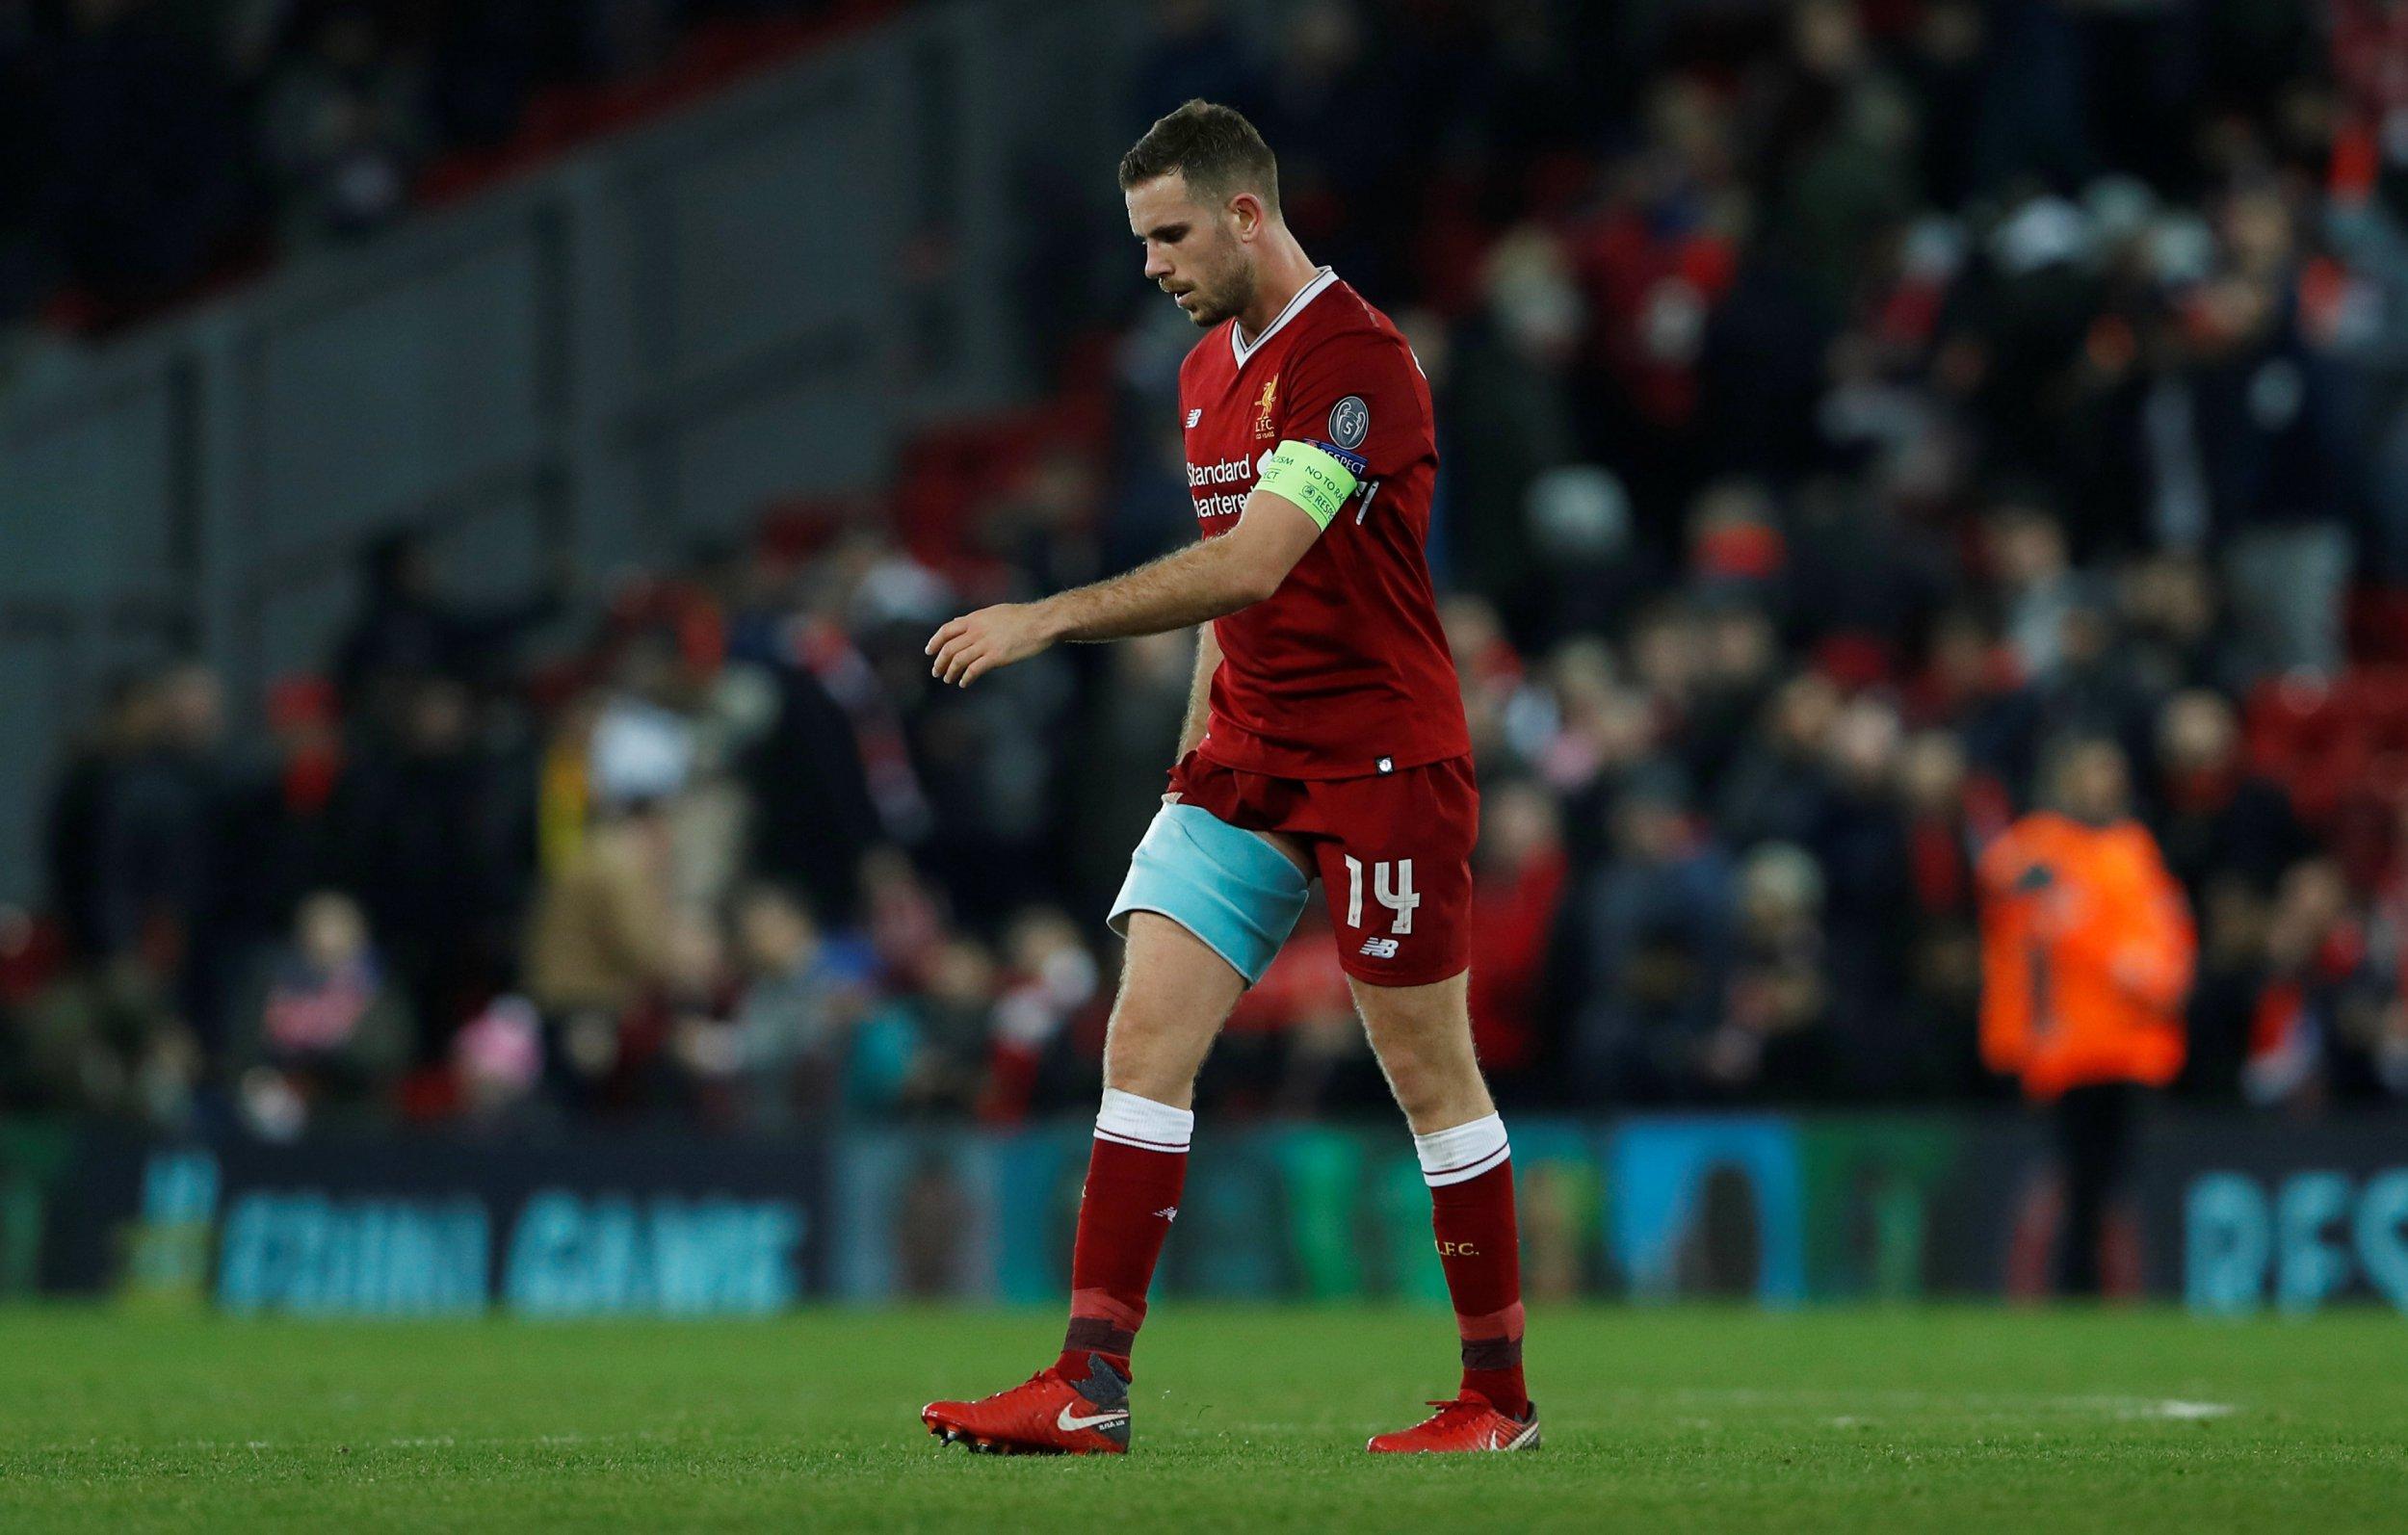 Liverpool captain Jordan Henderson allays injury fears ahead of Manchester United clash